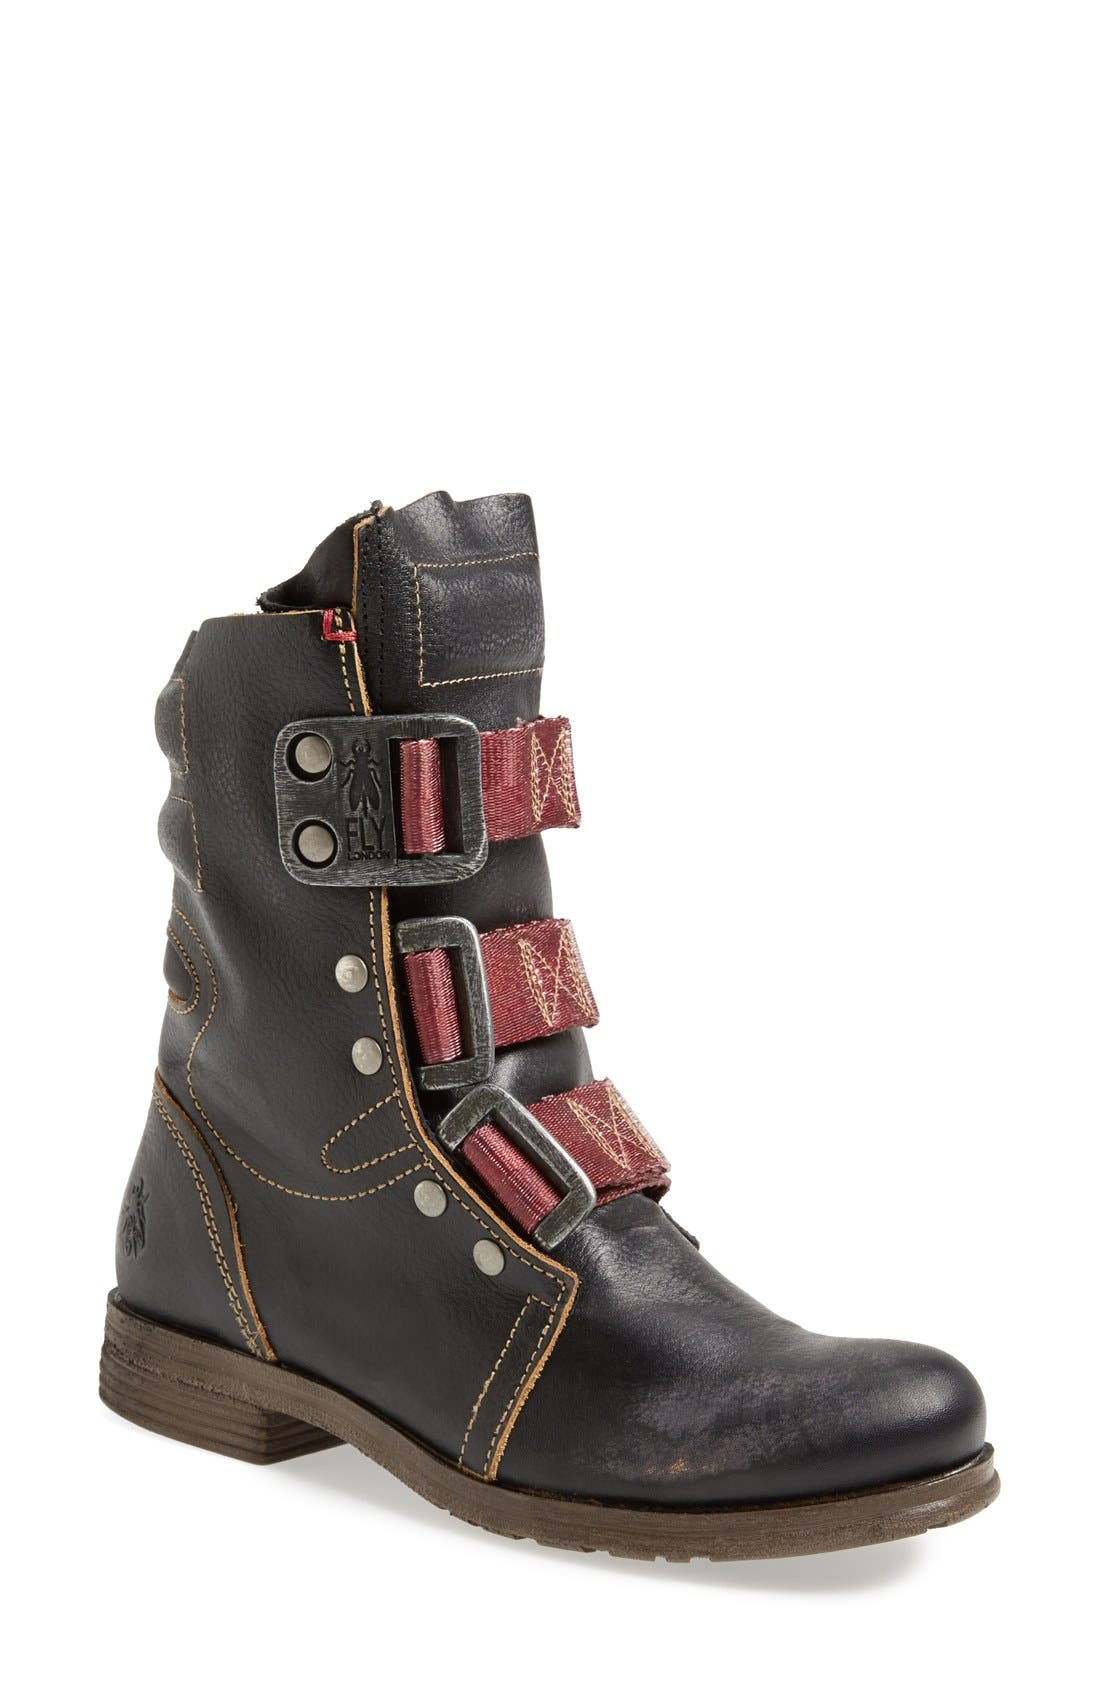 Main Image - Fly London 'Stif' Military Boot (Women)